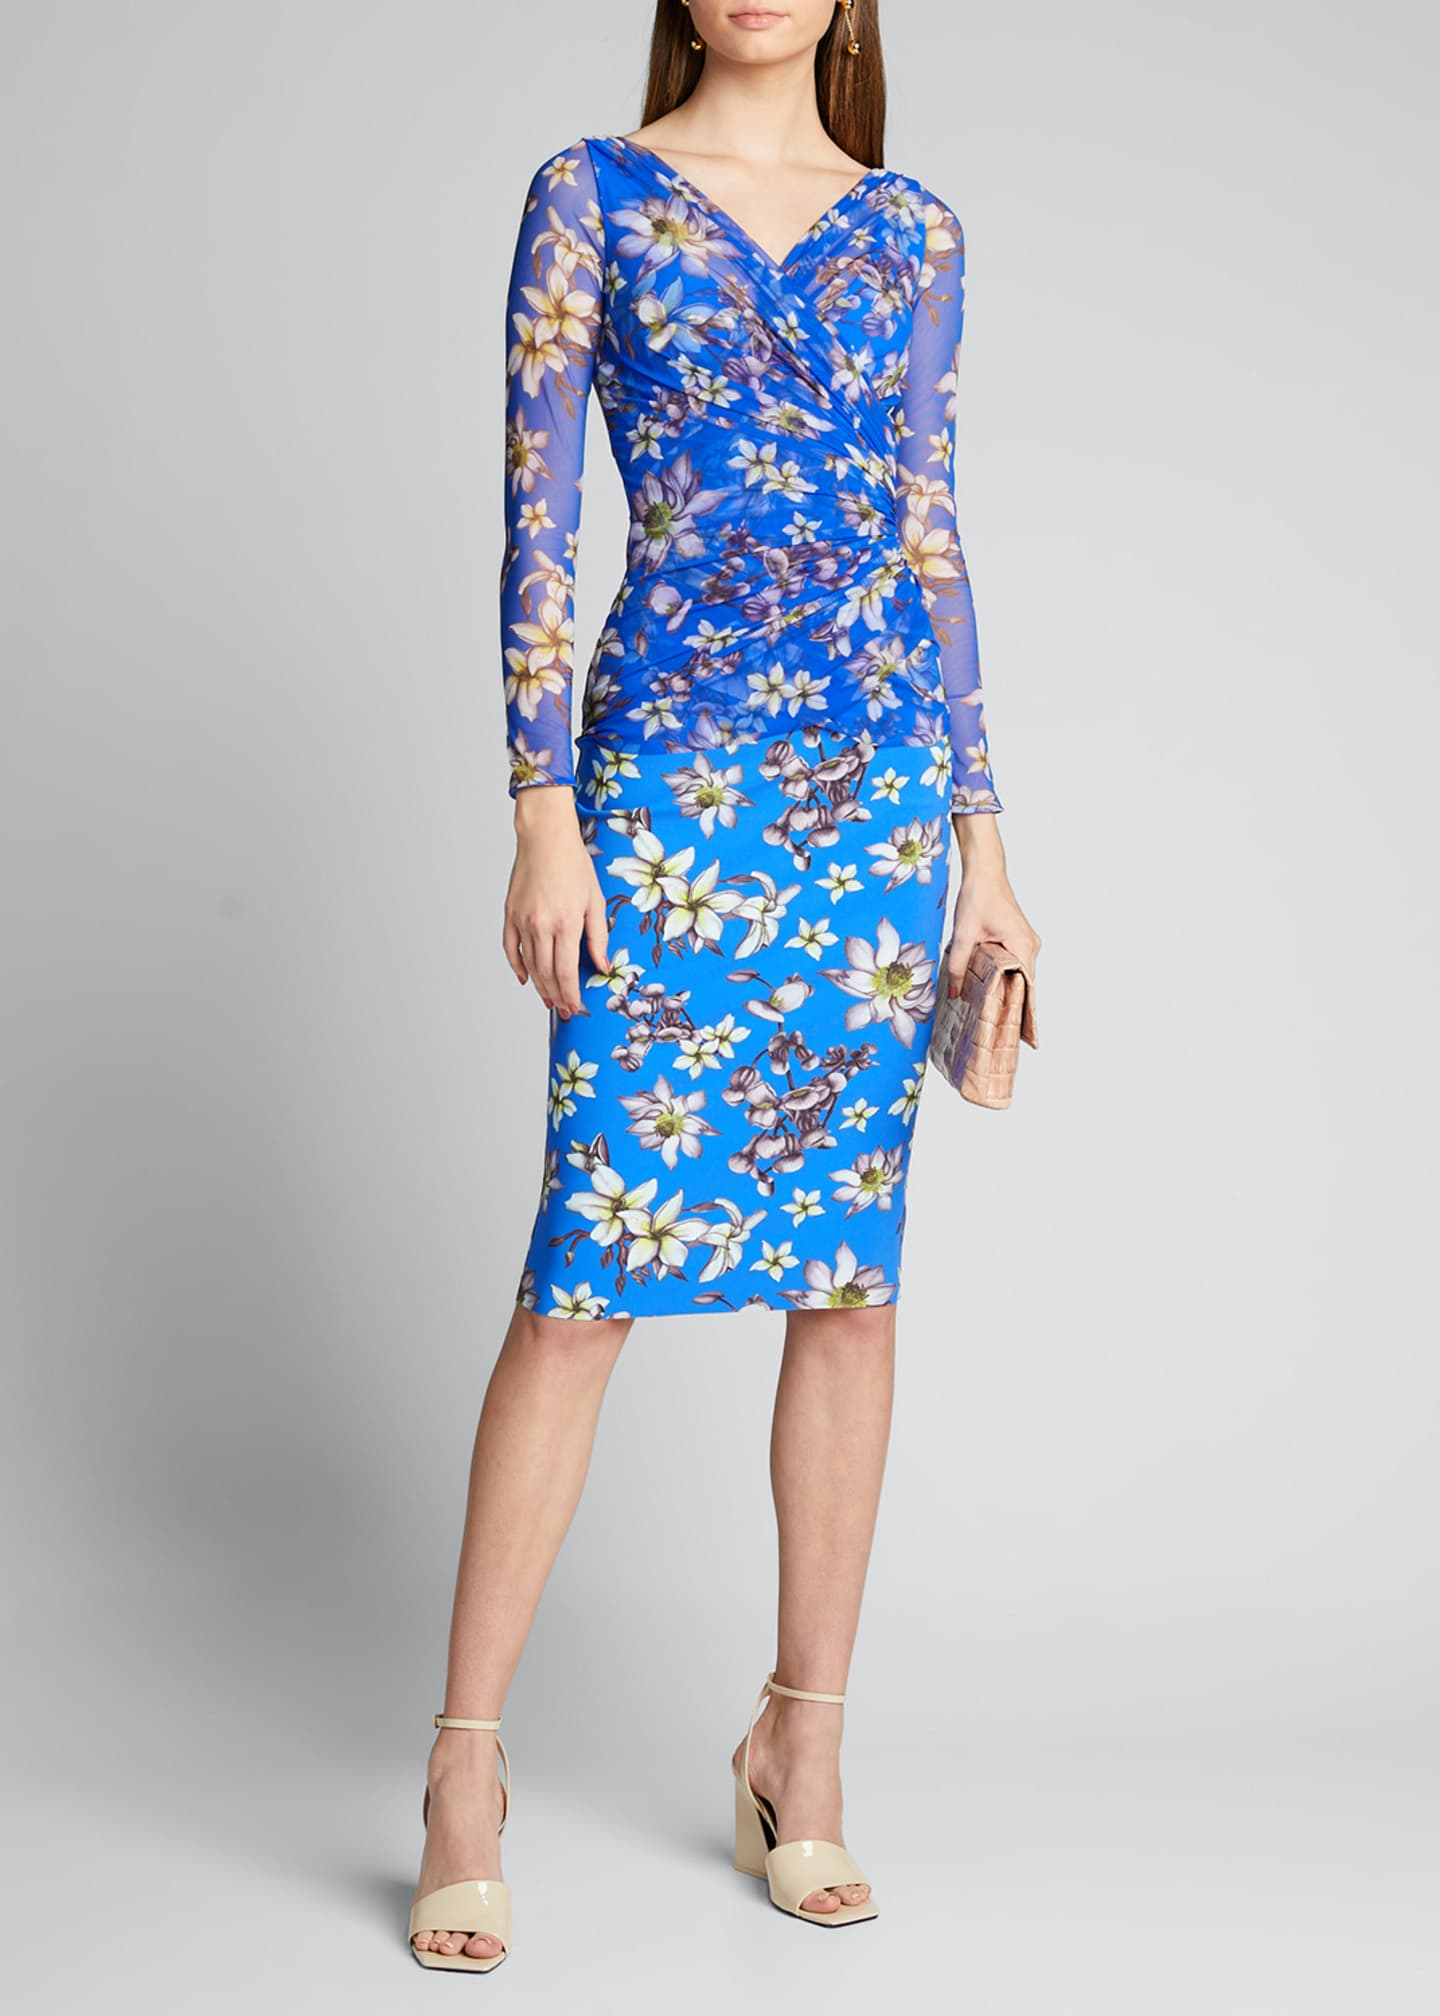 Chiara Boni La Petite Robe Floral V-Neck Long